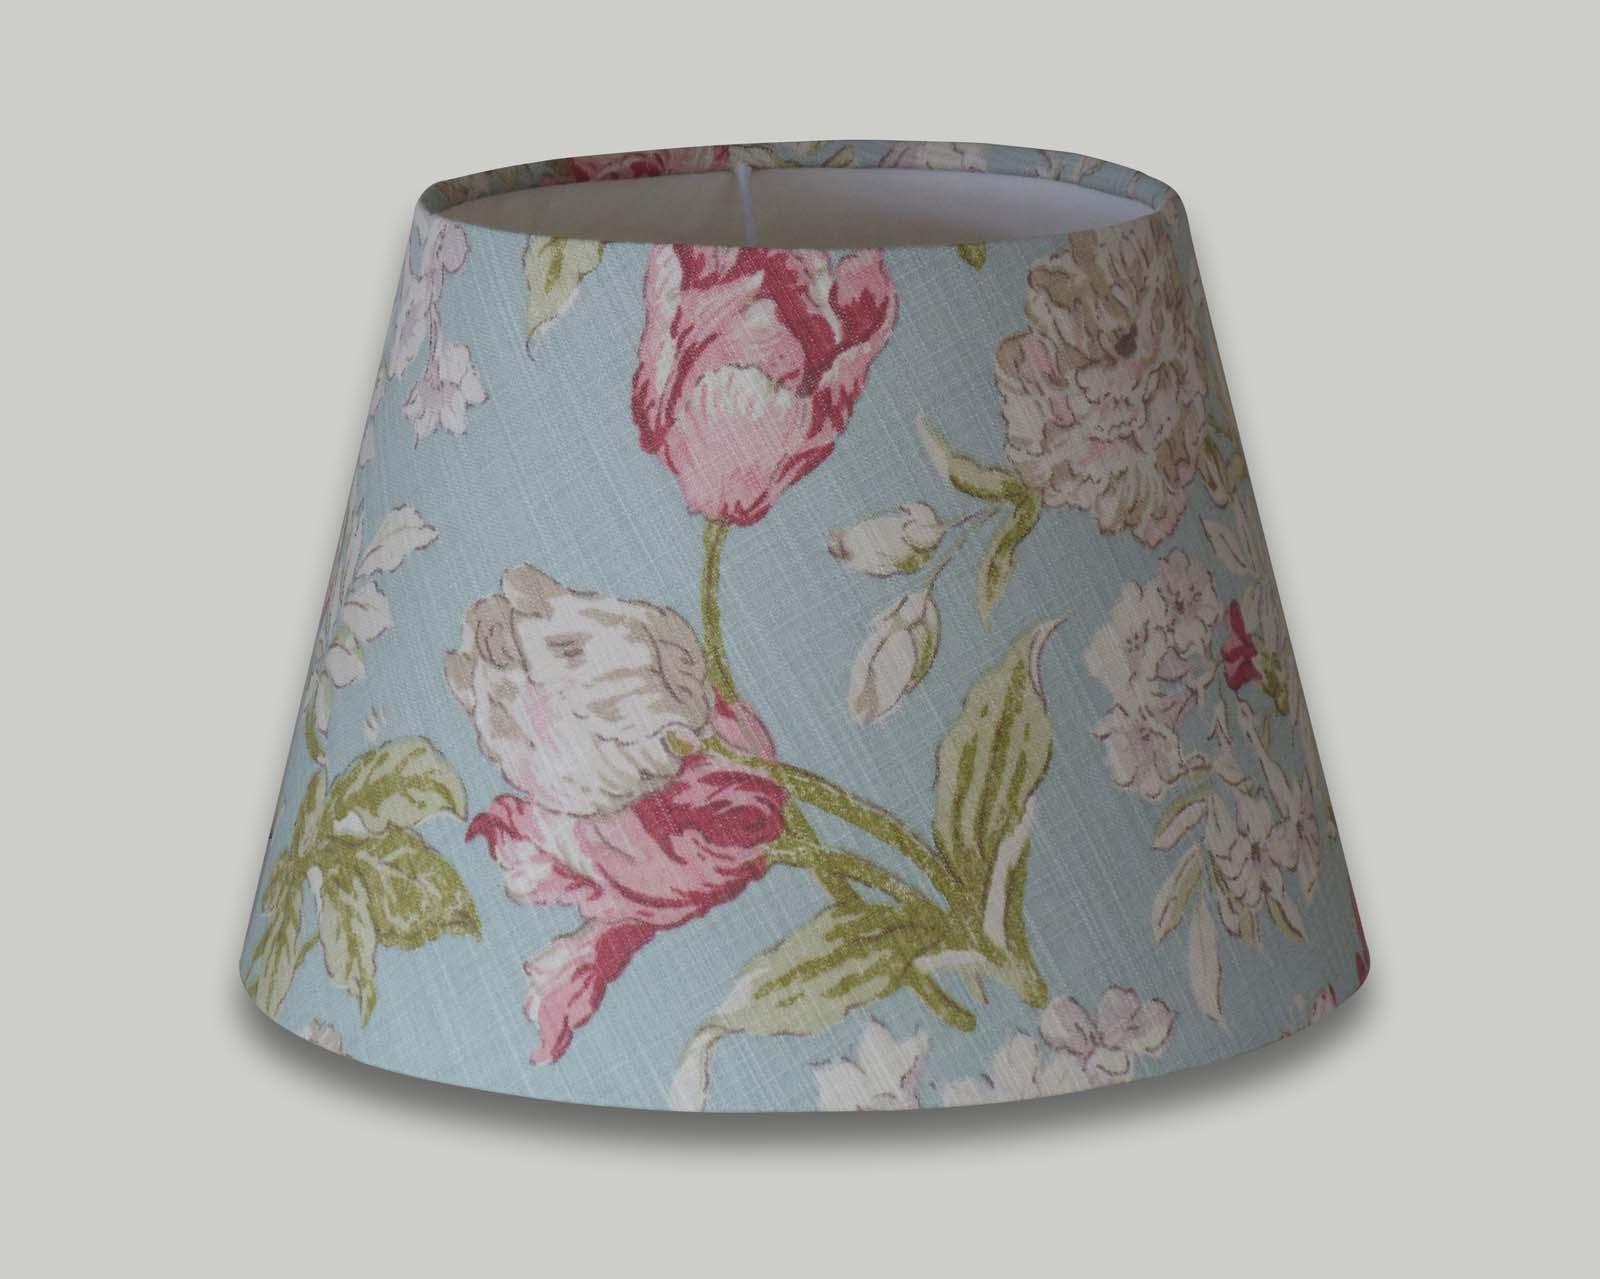 Campagna duckegg blue floral empire table lampshade the lampshade barn campagna duckegg blue floral empire table lampshade aloadofball Image collections